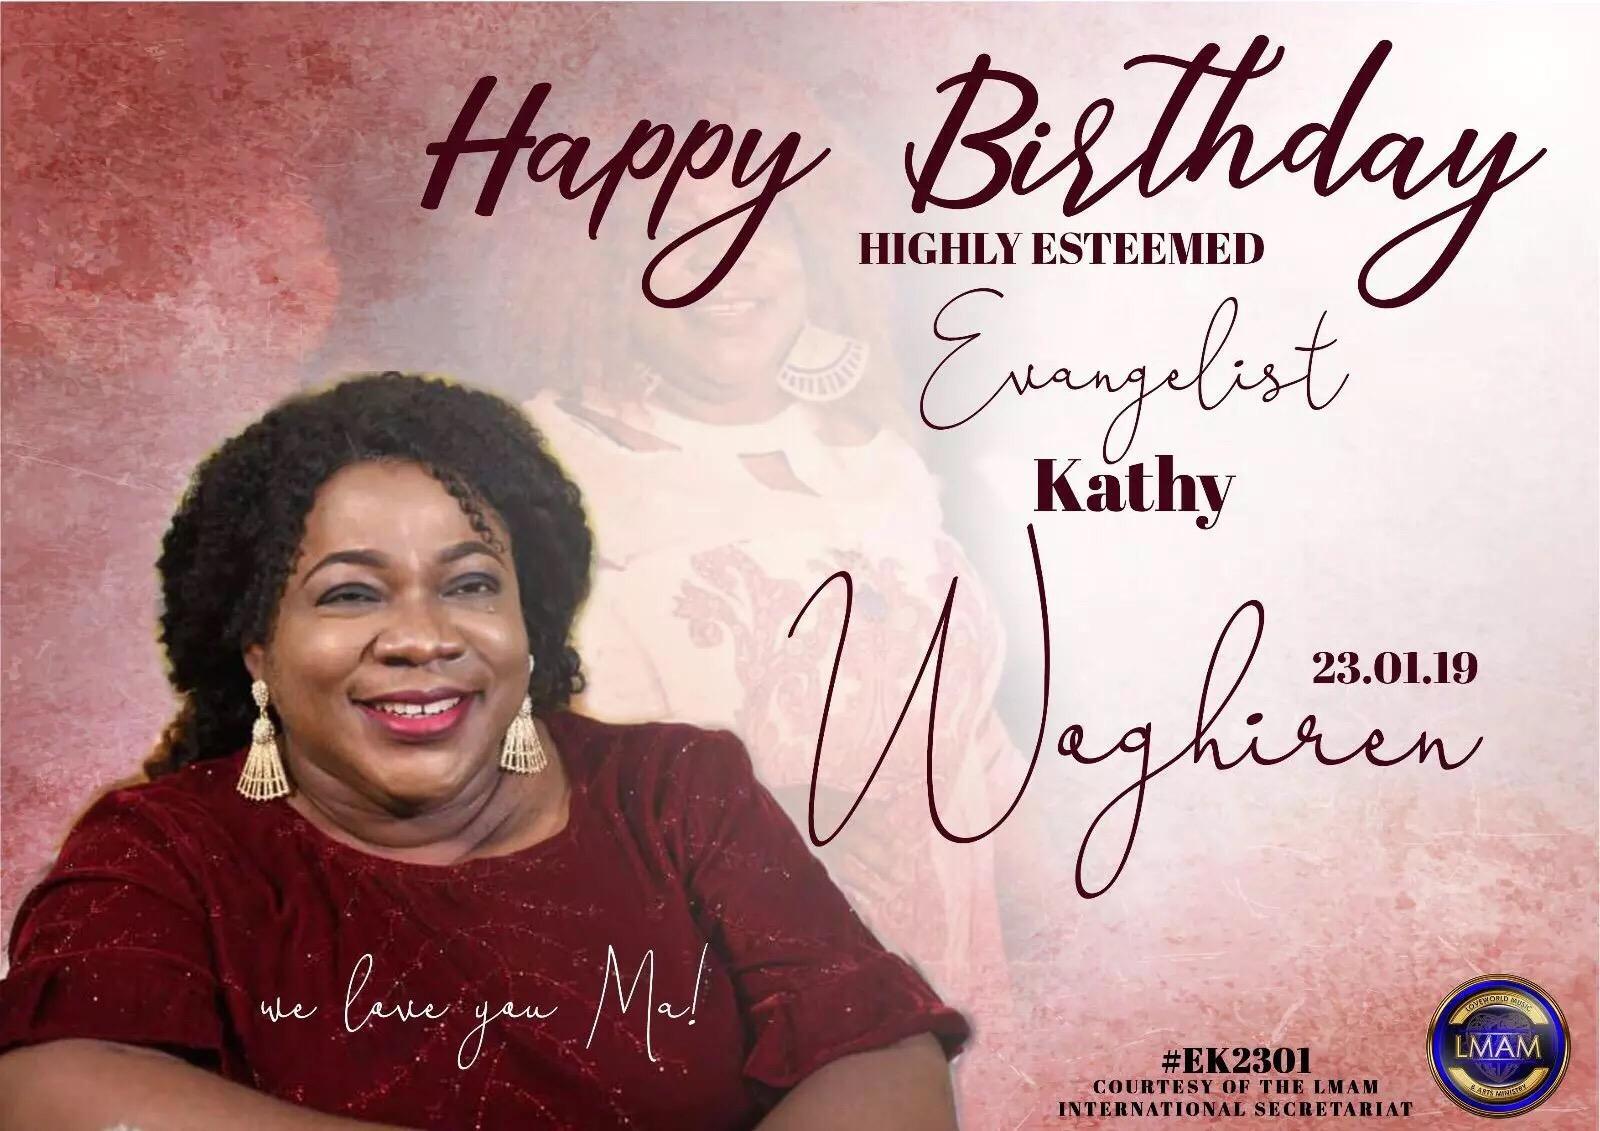 Happy Birthday Esteemed Evangelist Kathy